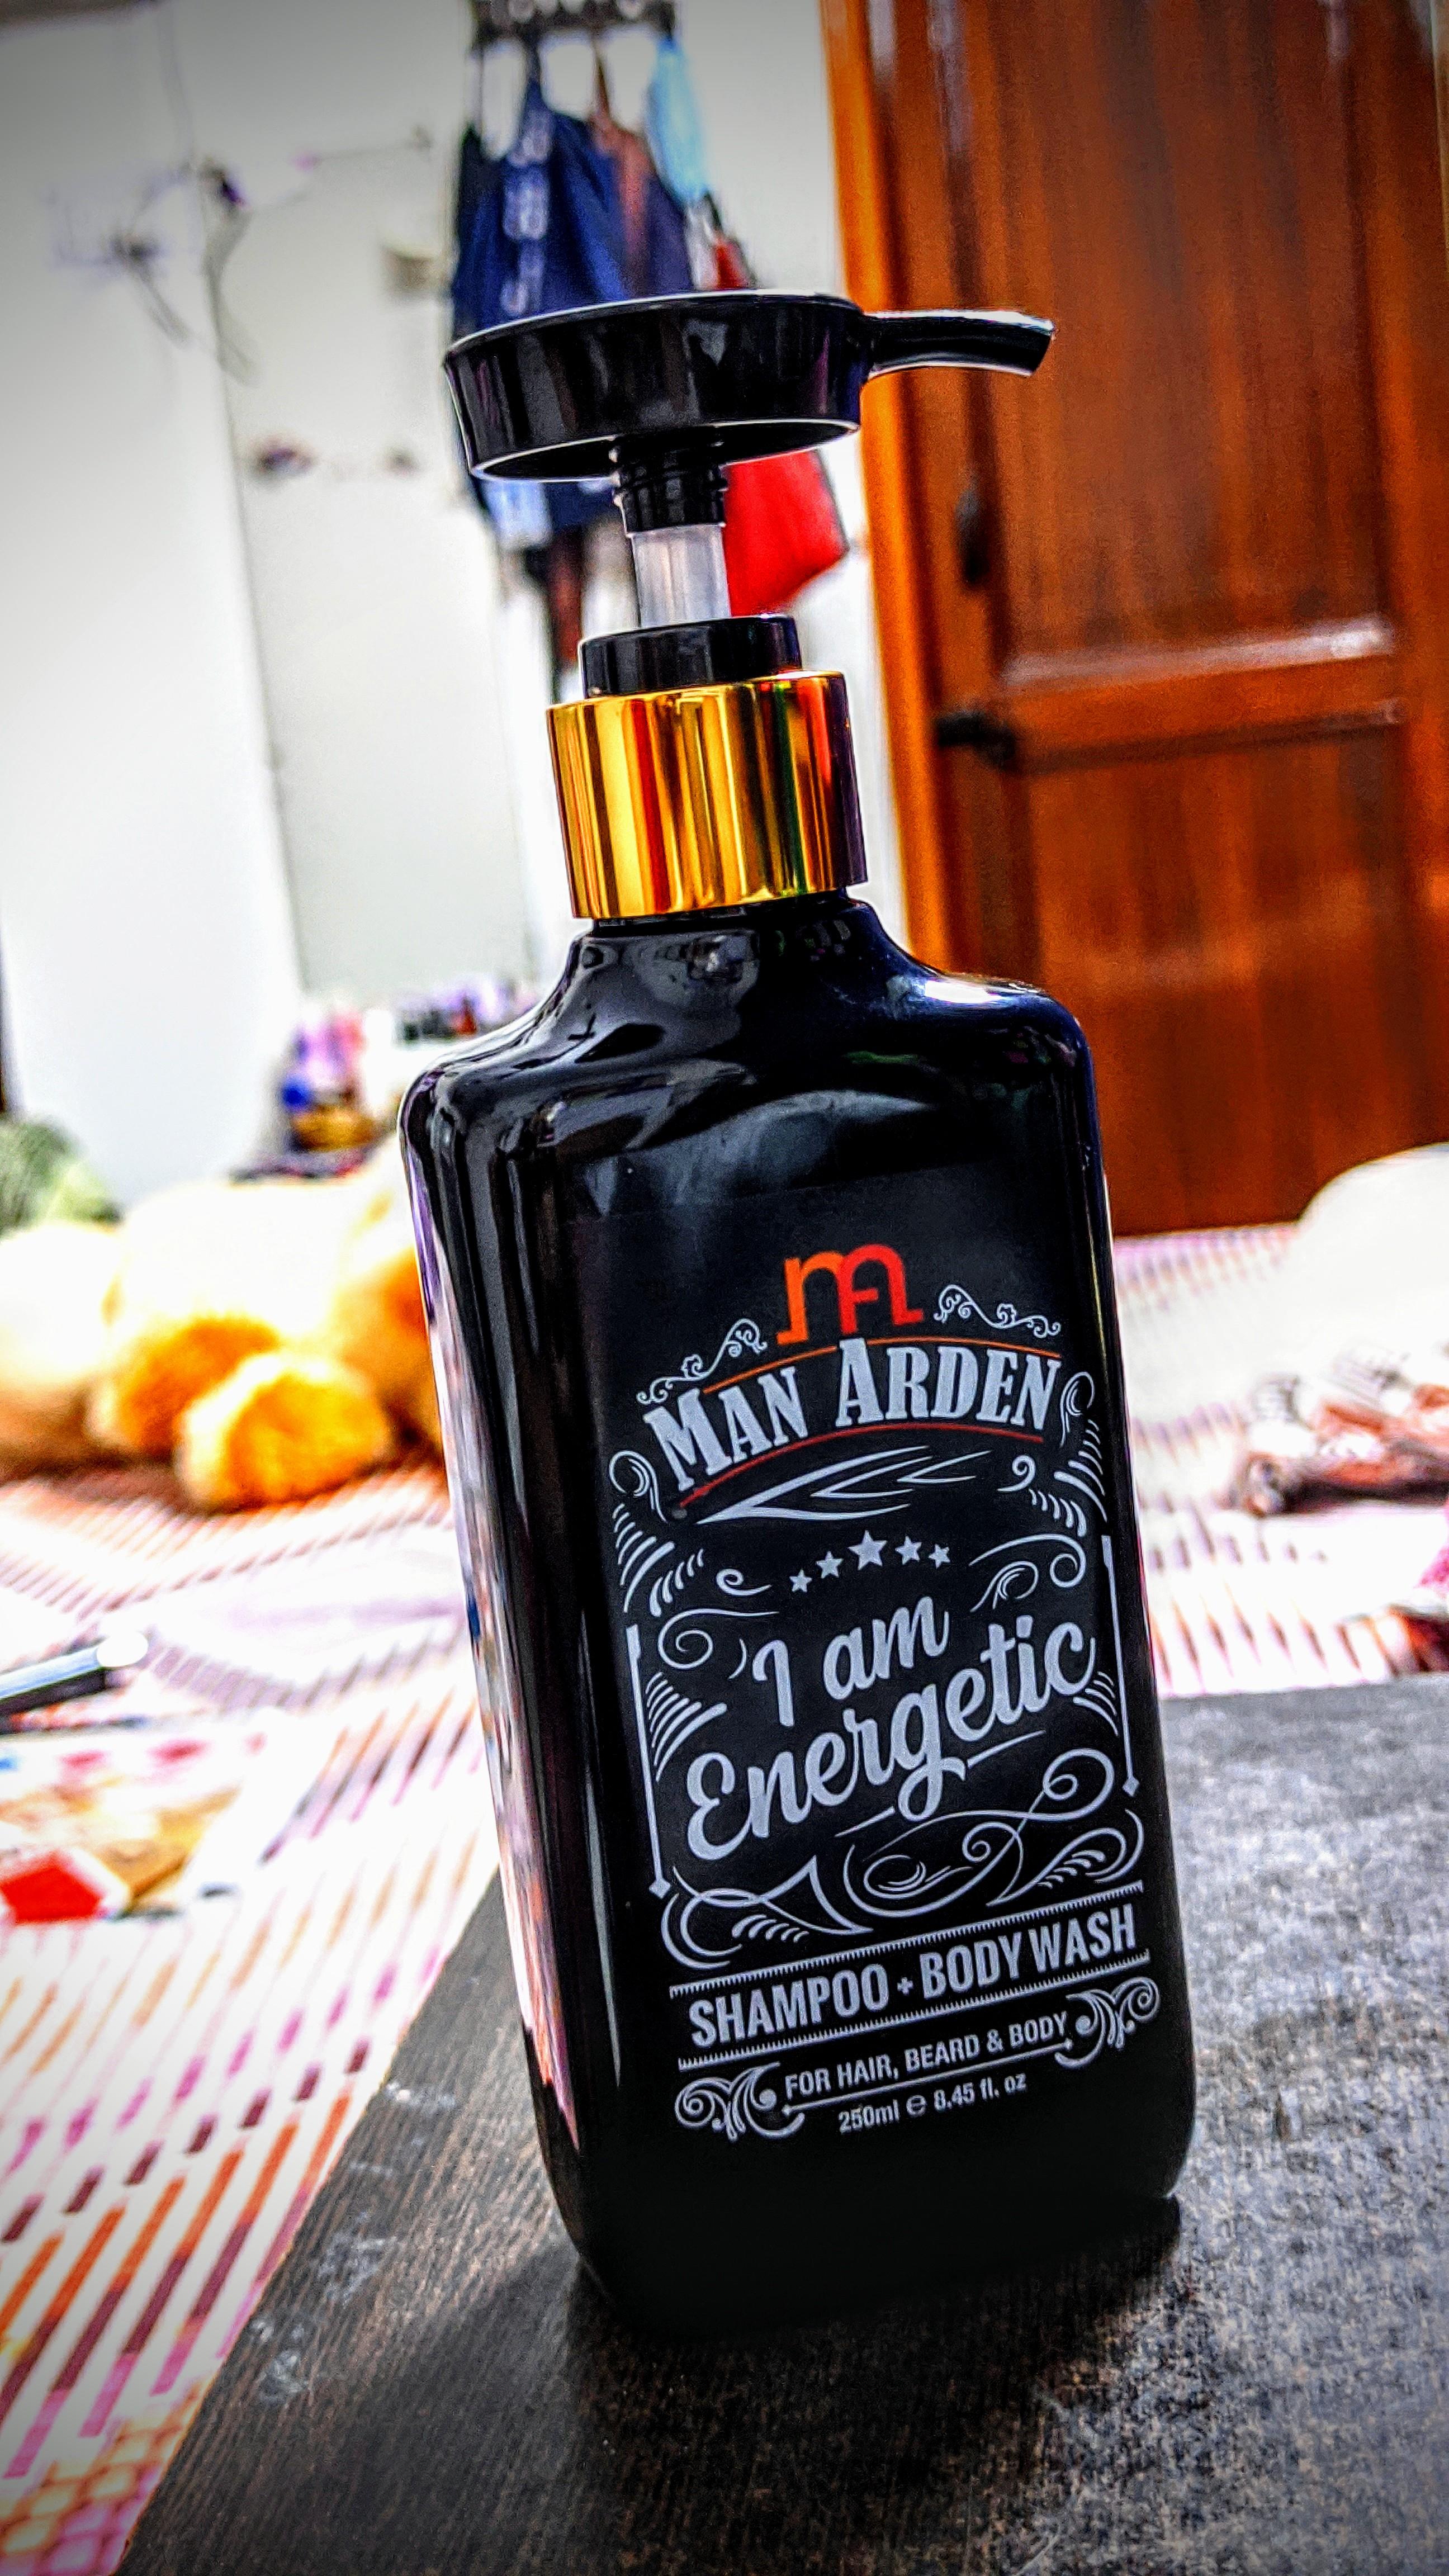 Man Arden I Am Energetic Shampoo Body Wash pic 1-Long Lasting fragrance-By born_foodie